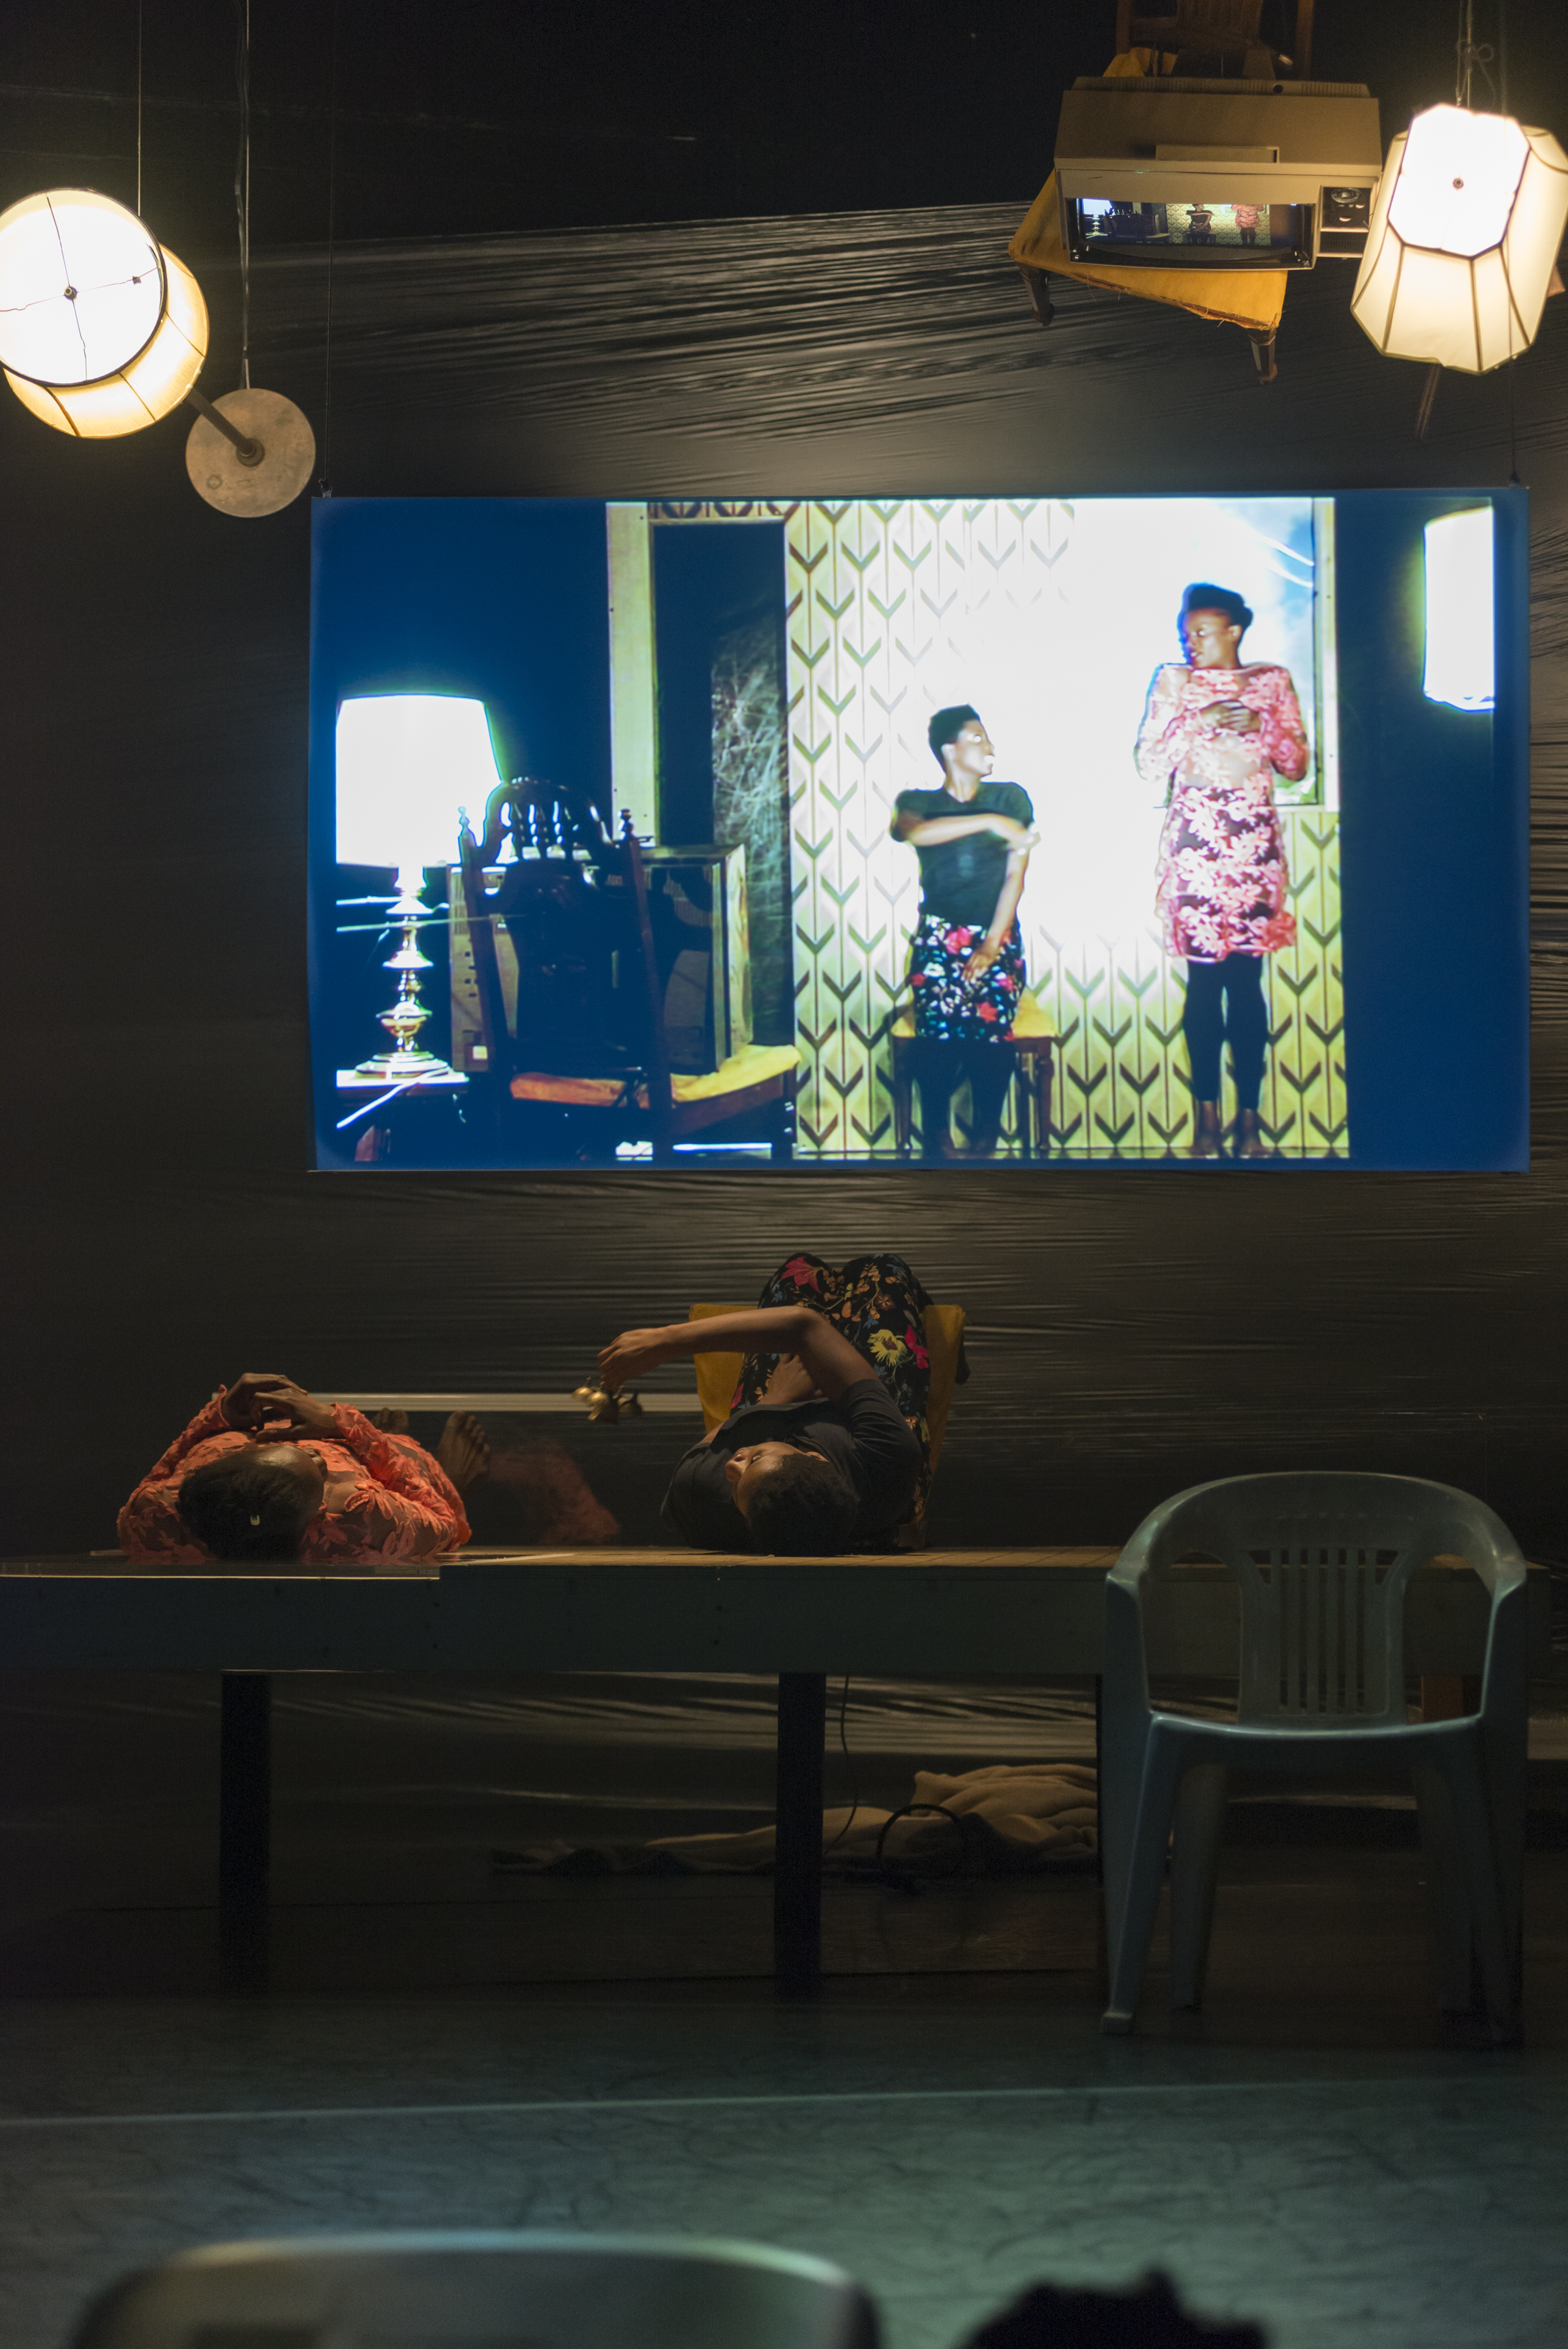 Performance view, Okwui Okpokwasili: Poor People's TV Room, MCA Chicago April 12 – 15, 2018 Photo: Nathan Keay, ©MCA Chicago.